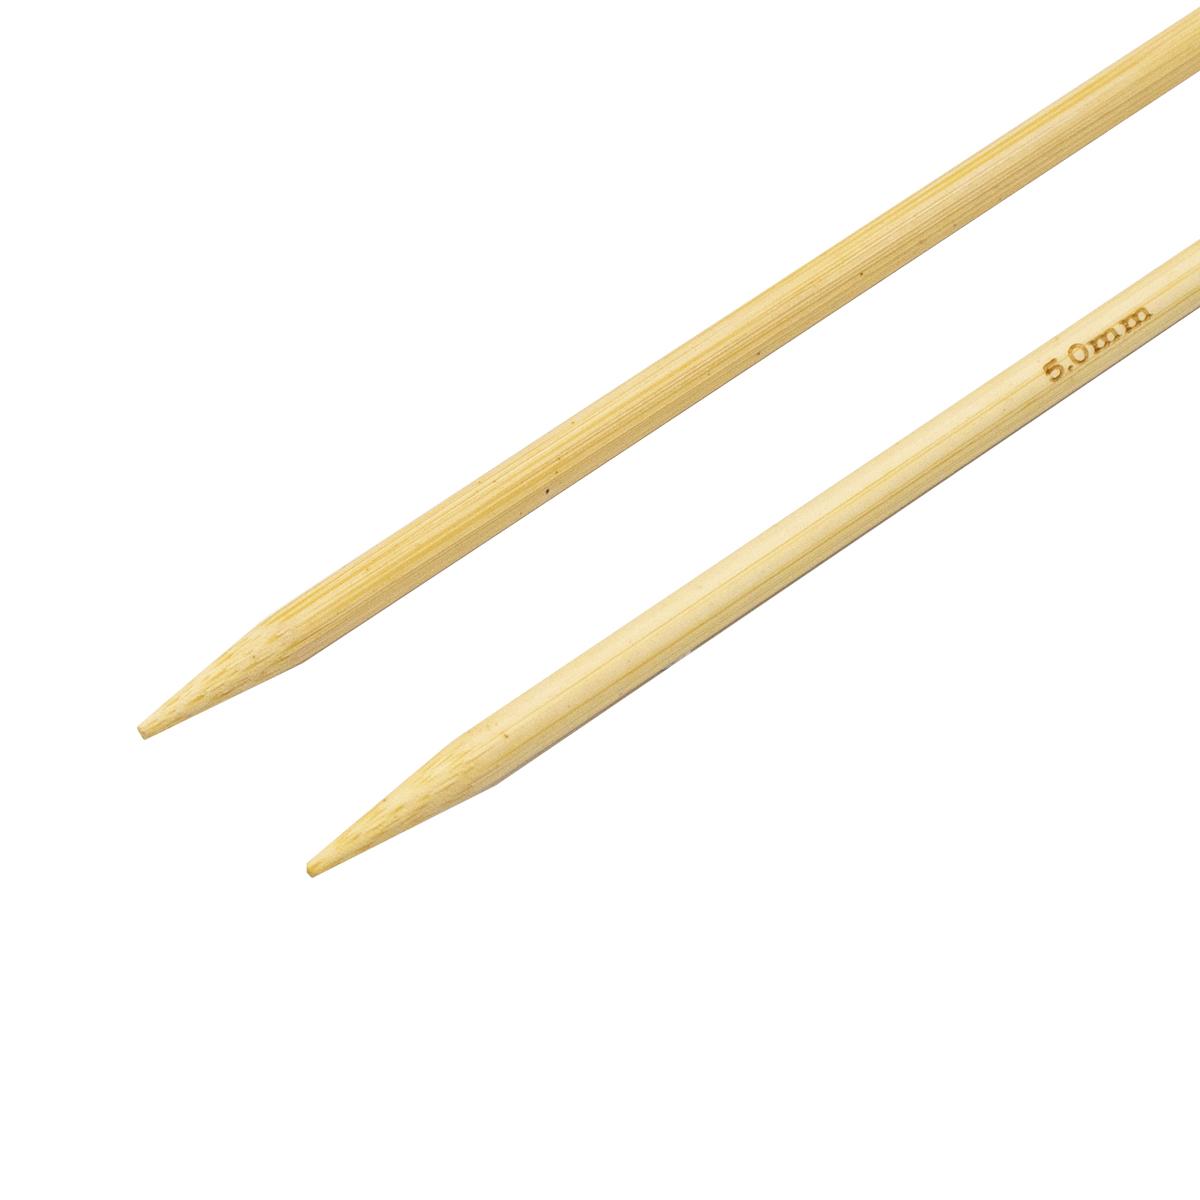 Спицы круговые бамбук 942150, 100 см, 5,0 мм, Hobby&Pro